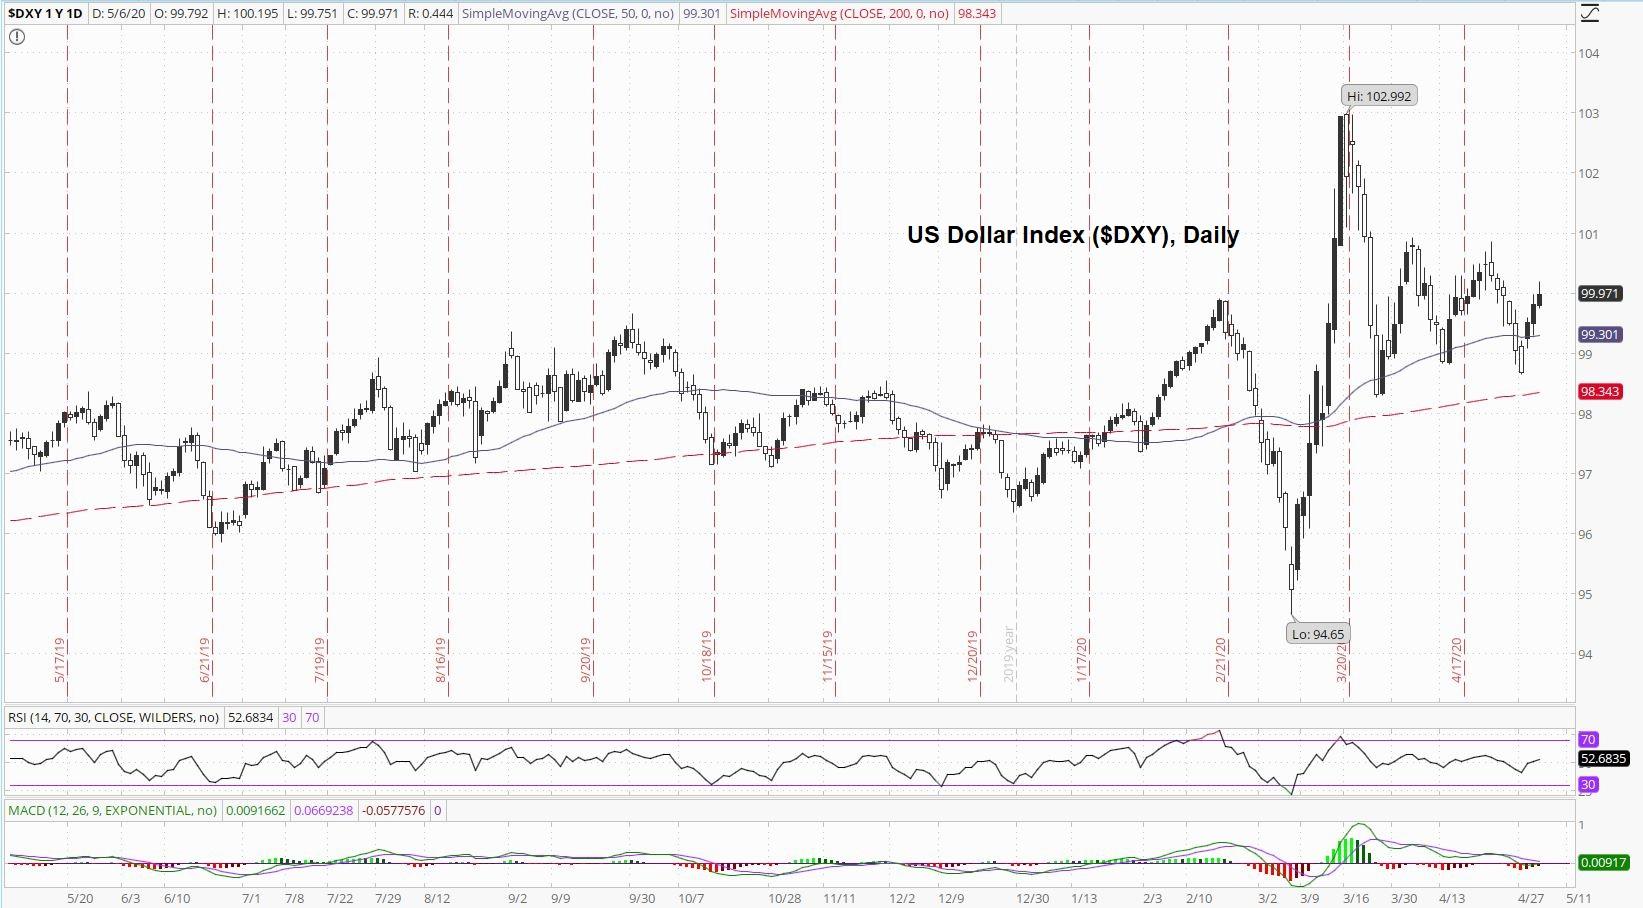 US Dollar Index Daily